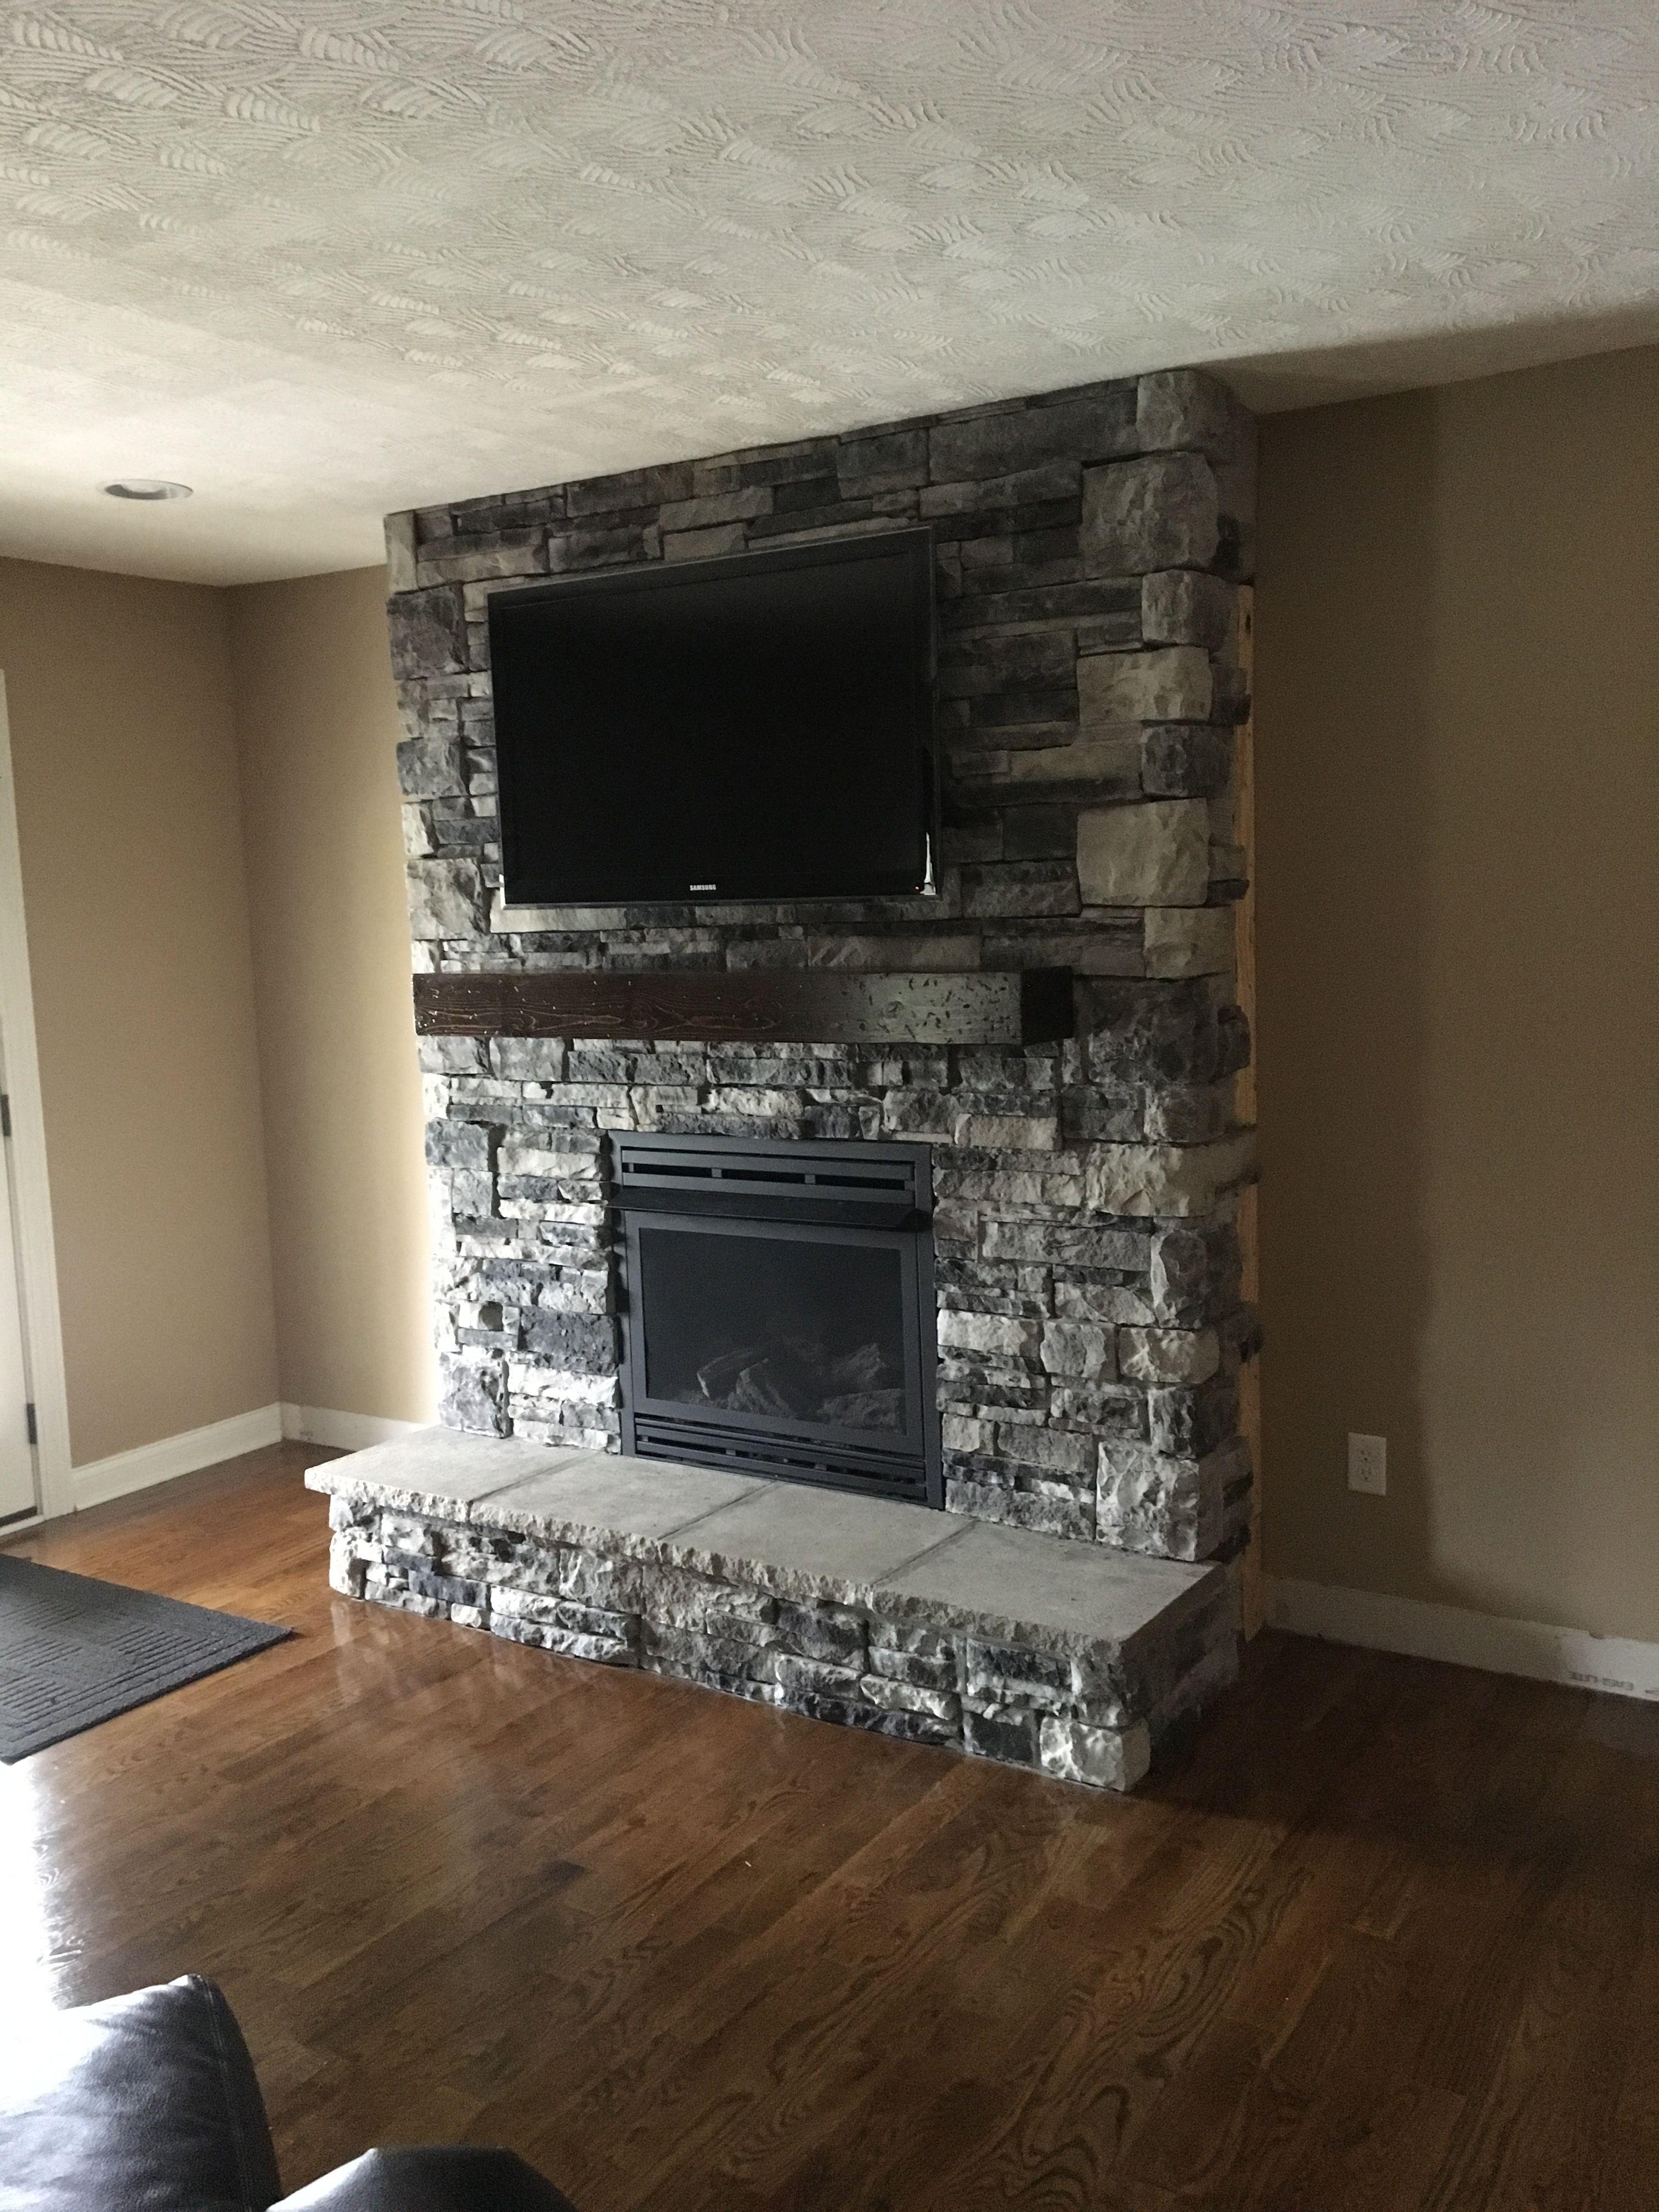 Dyi Mountain Stone Fireplace W Natural Gas Ventless Logs Fireplace Remodel Fireplace Gas Fireplace Logs